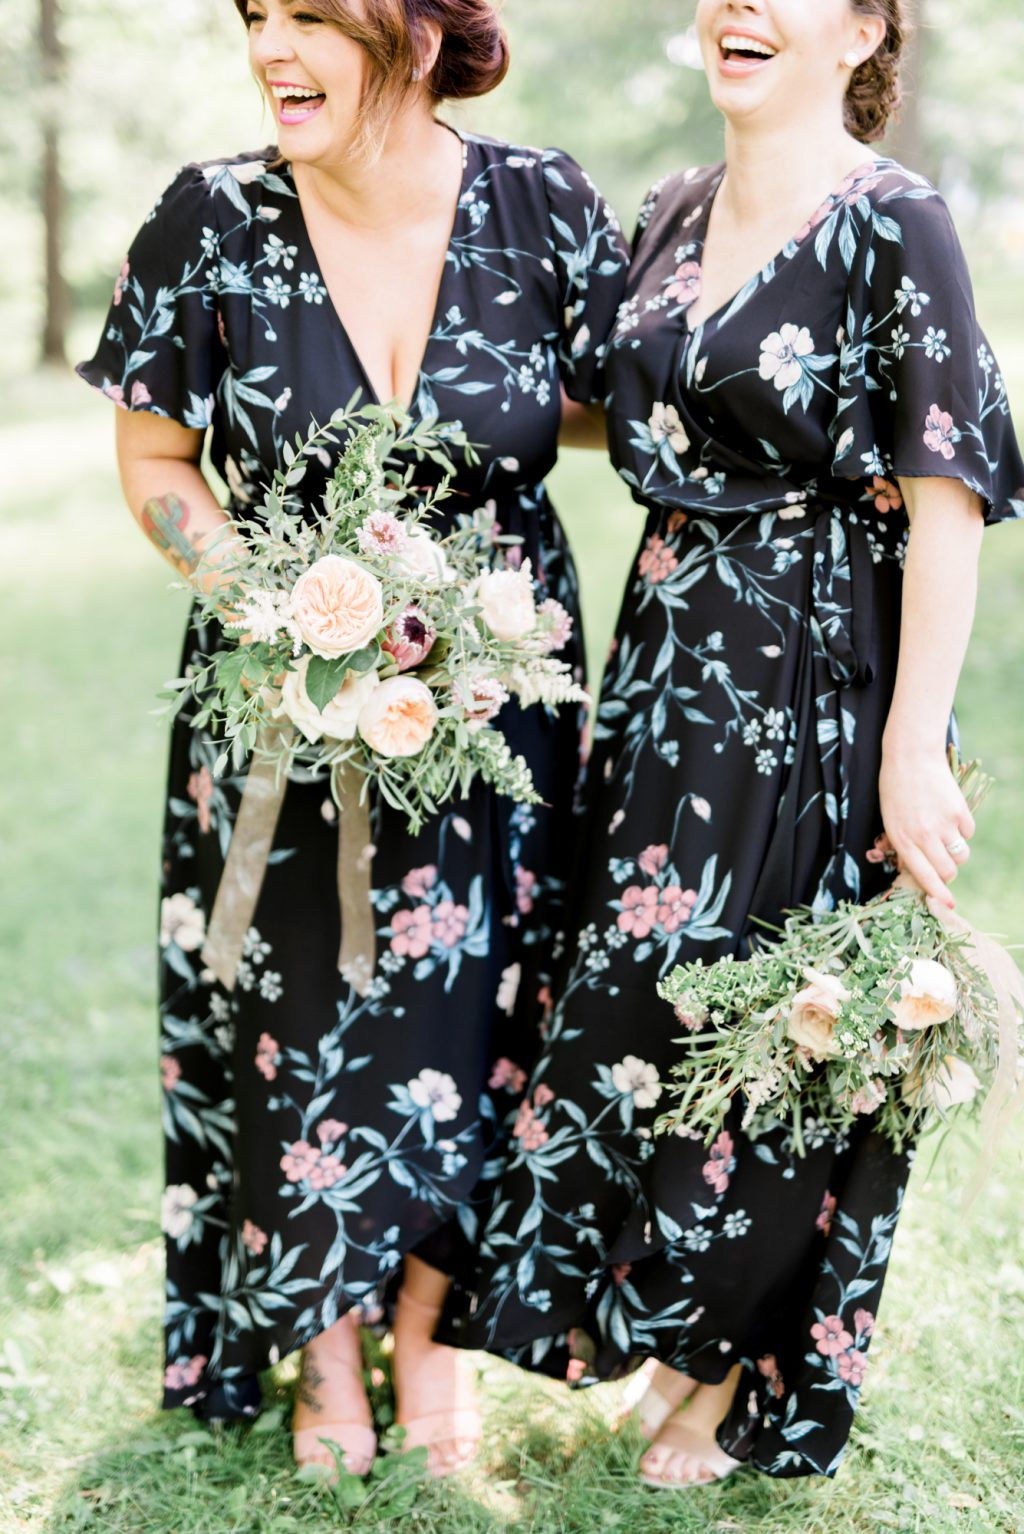 haley-richter-photo-west-chester-summer-wedding-boxcar-brewery-067